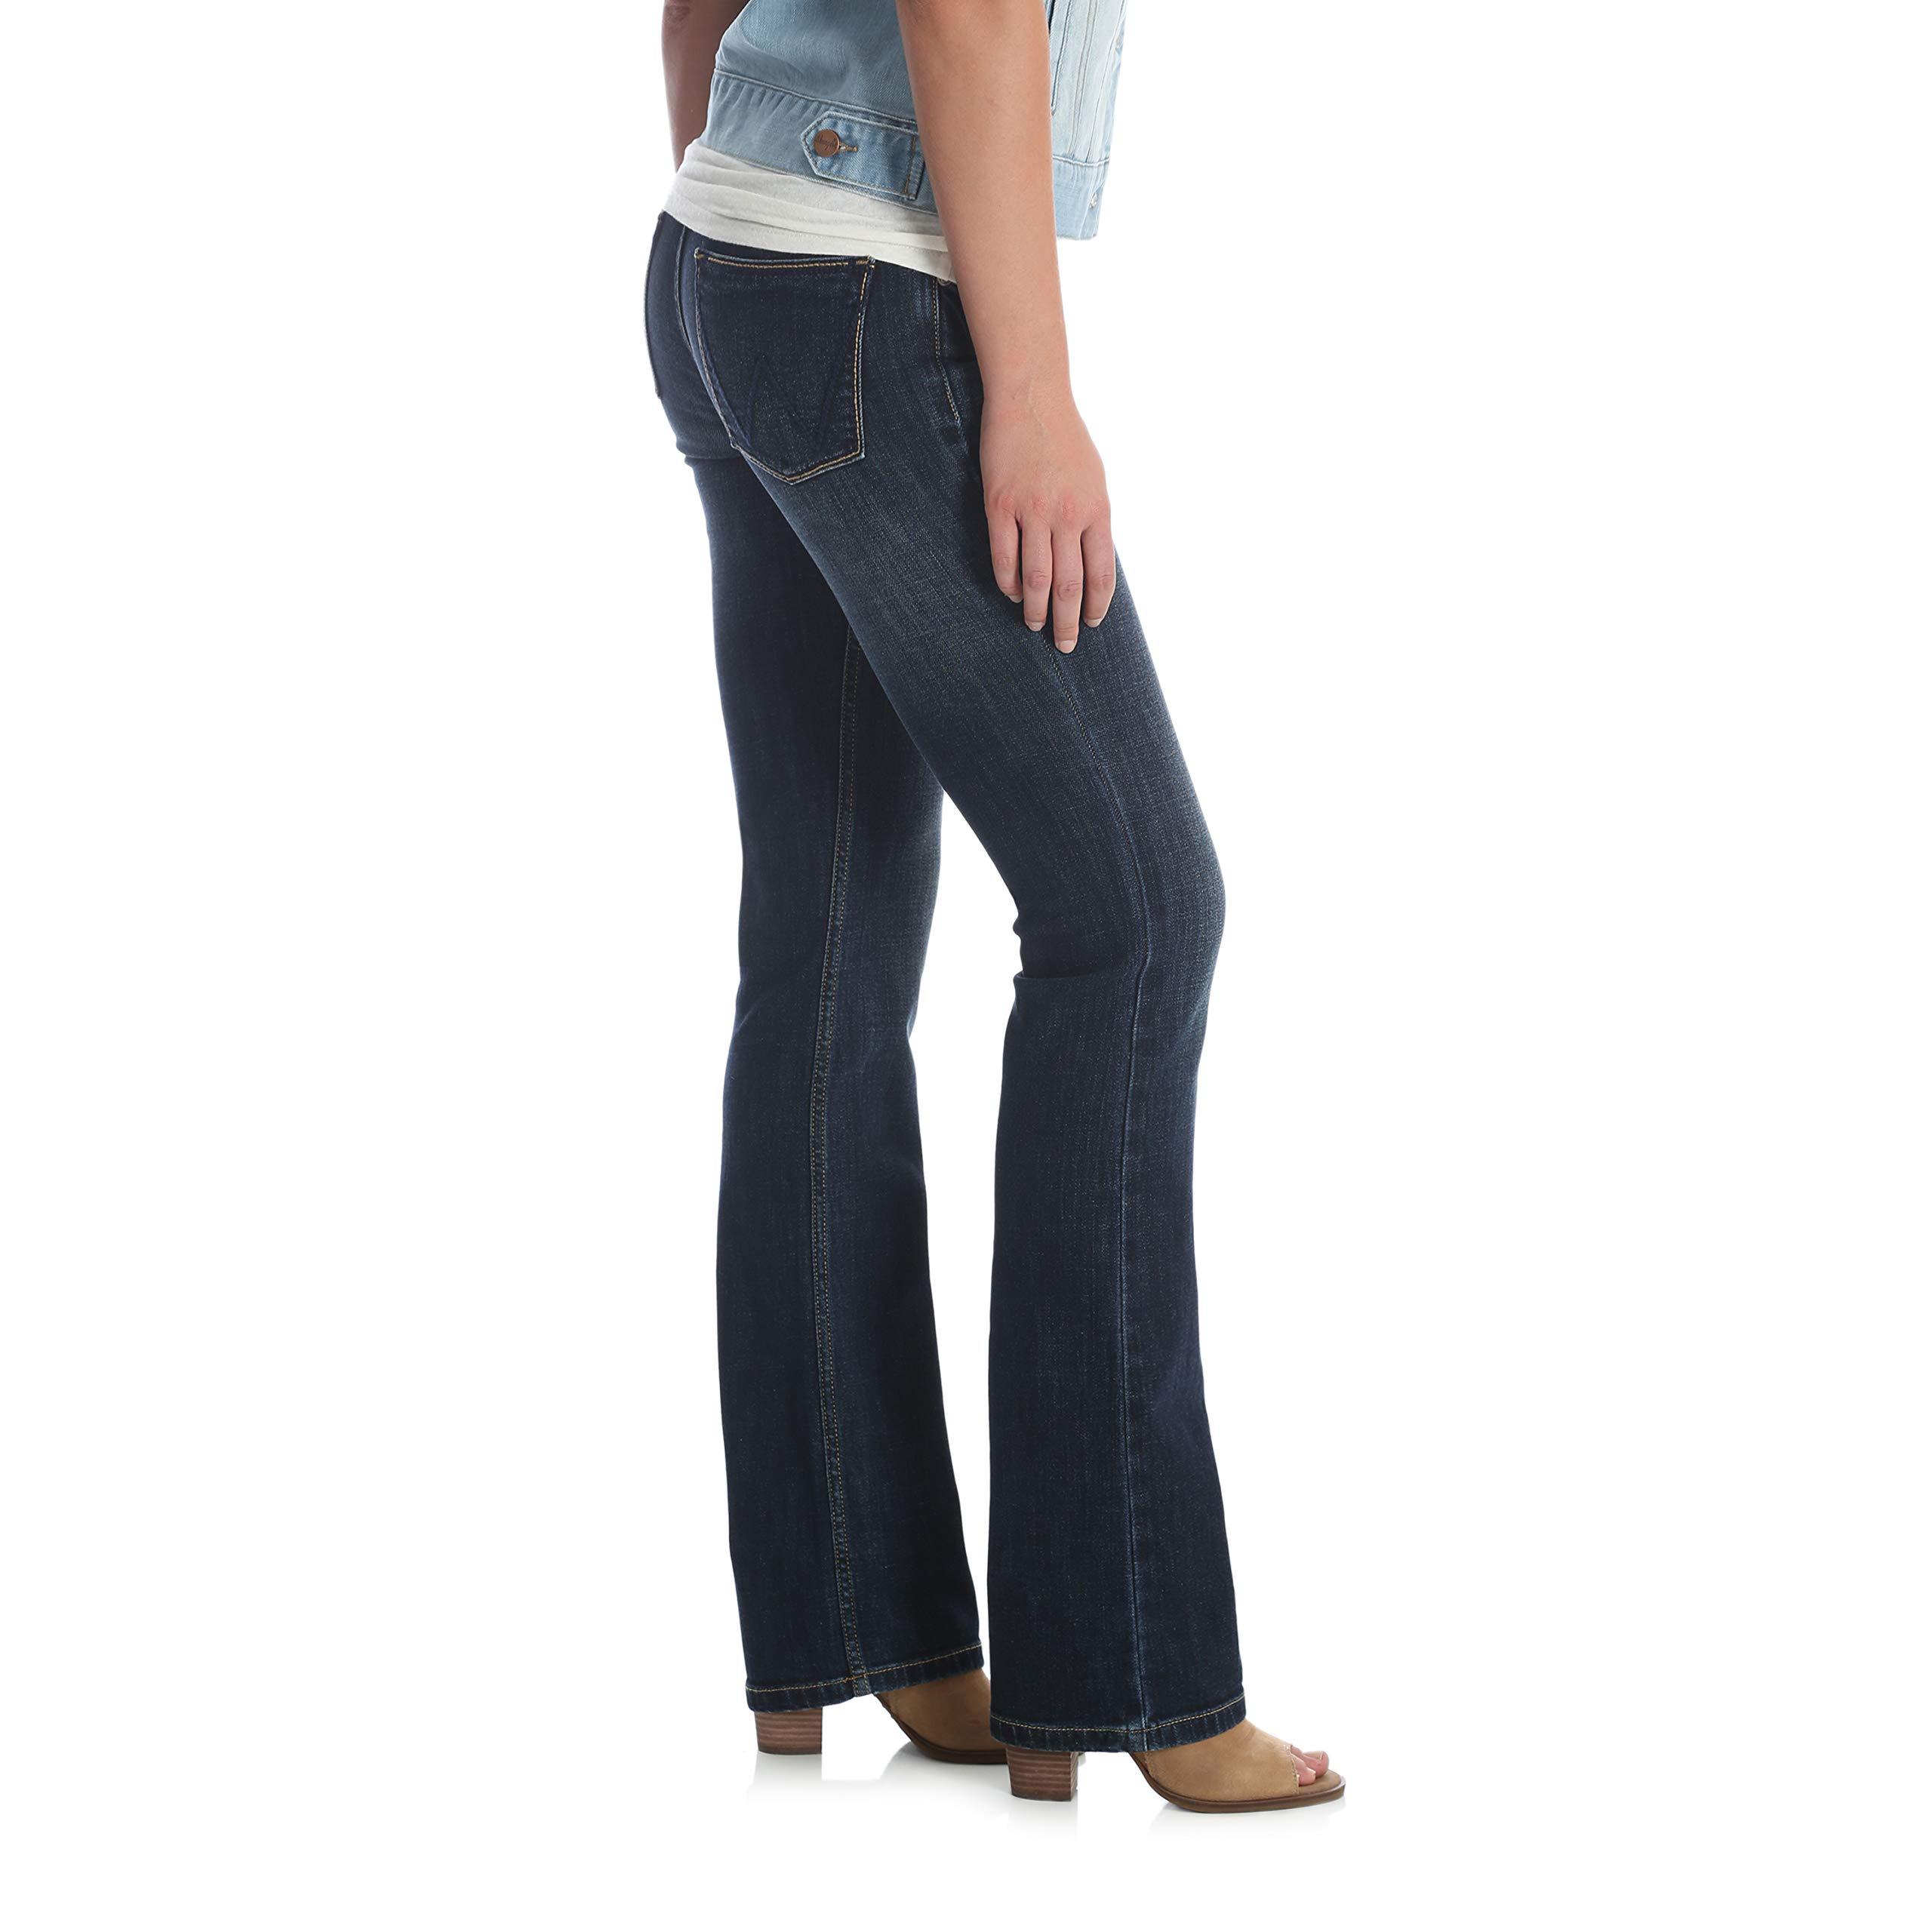 07MWZFK Wrangler Women/'s Retro Sadie Boot Cut Jean Low Rise NEW